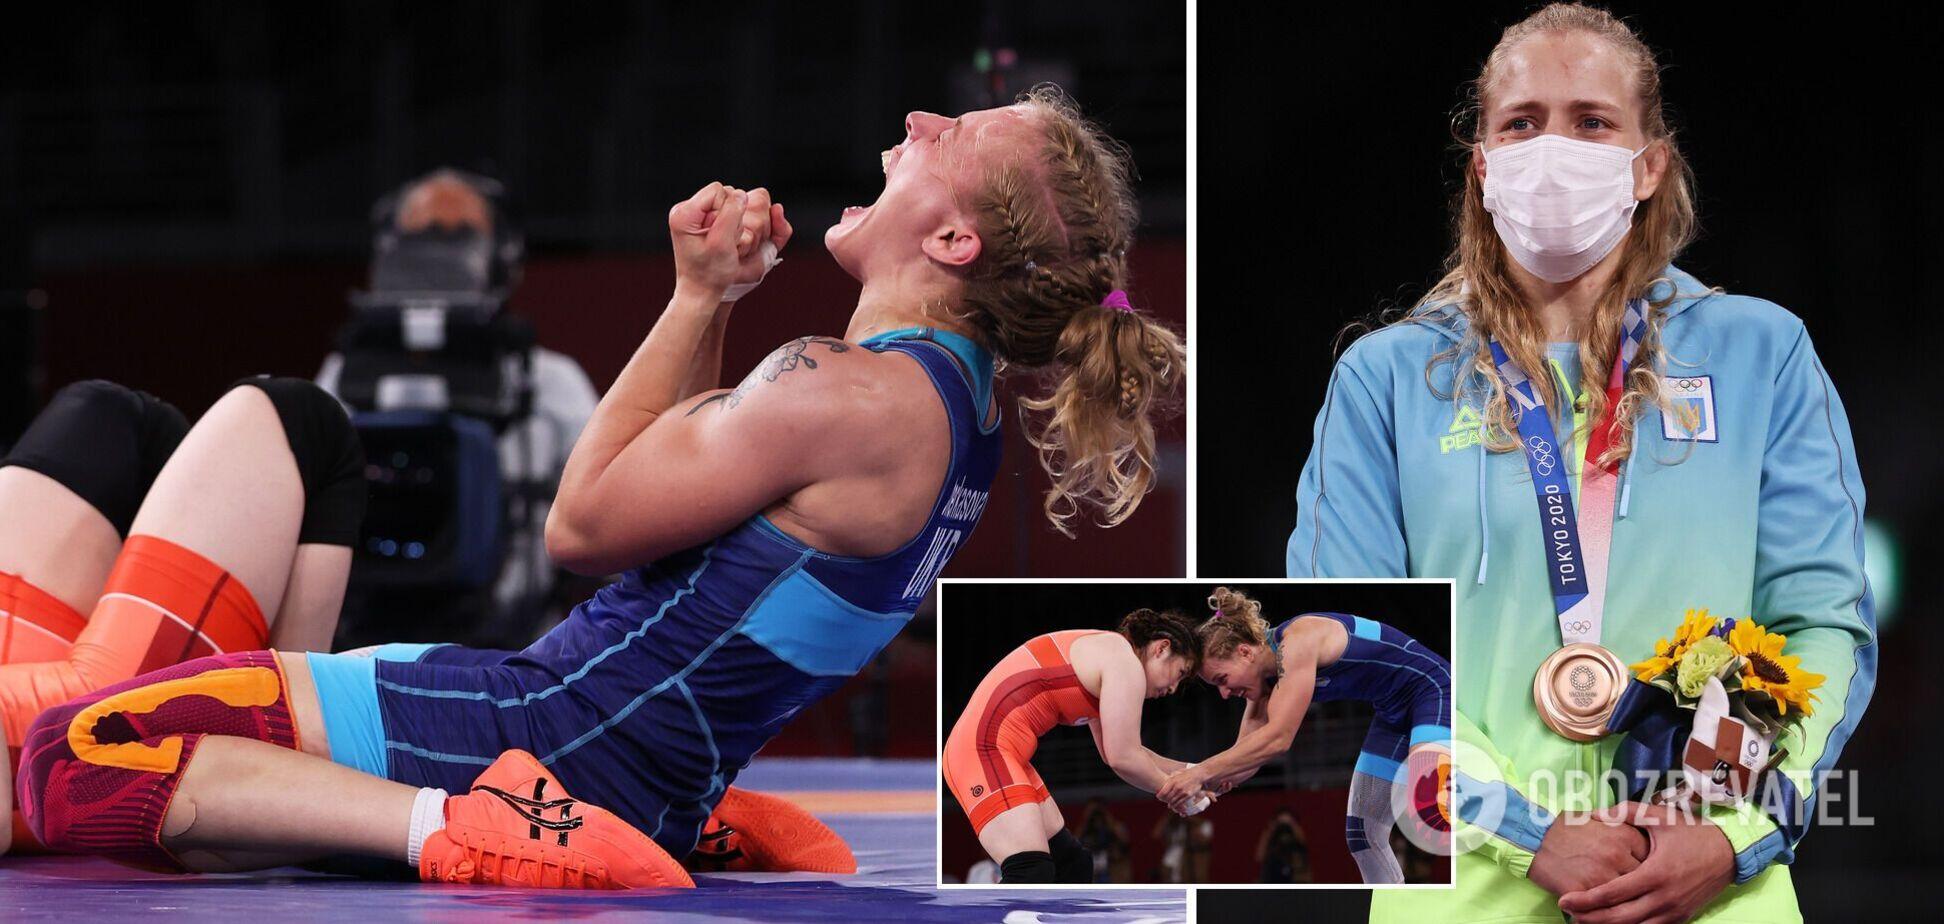 Украина сенсационно завоевала 7-ю медаль на Олимпиаде-2020